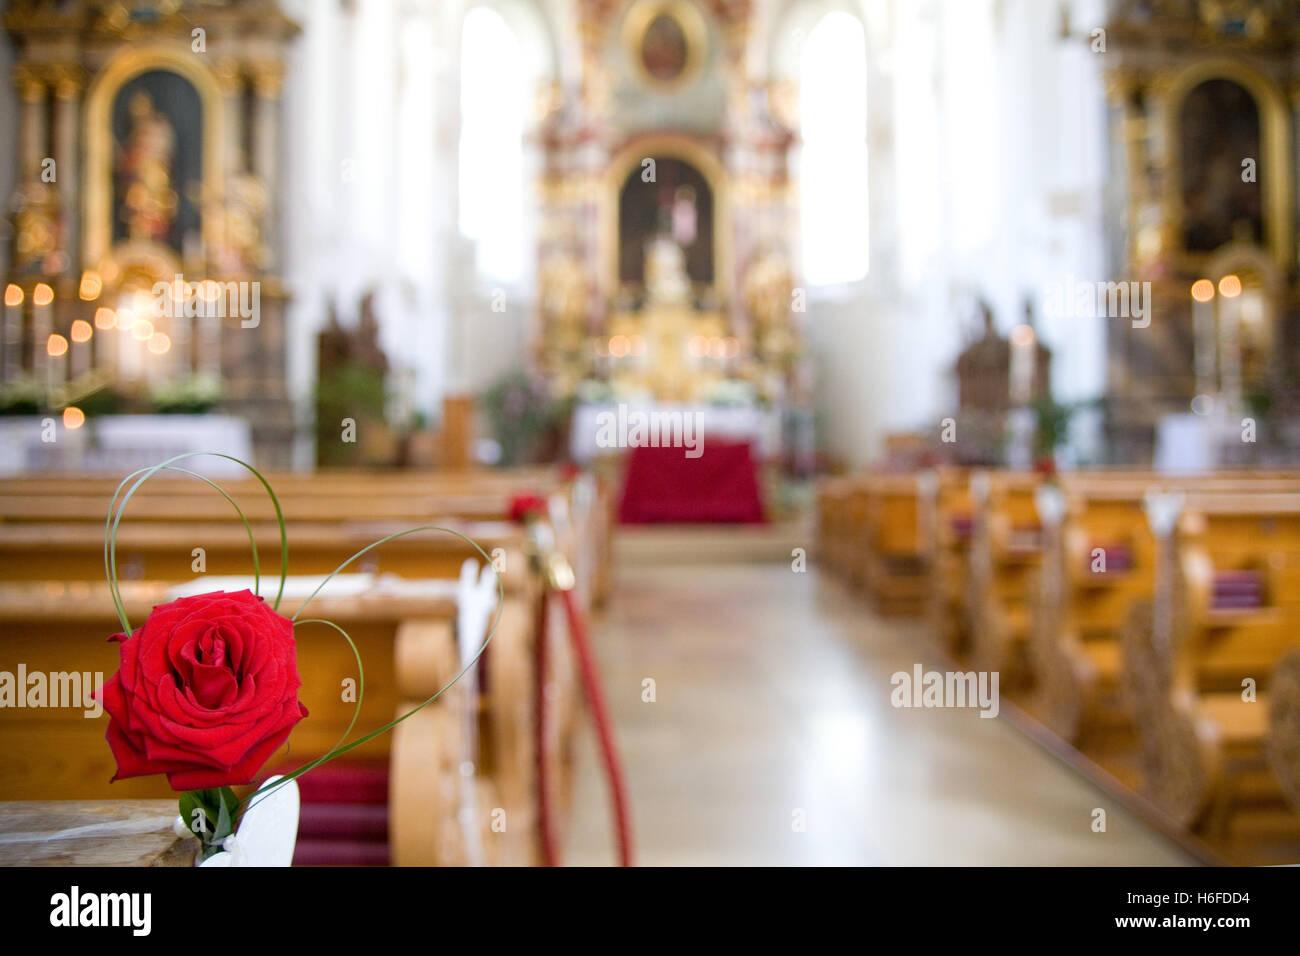 Christian Wedding Decoration Rose In A Church